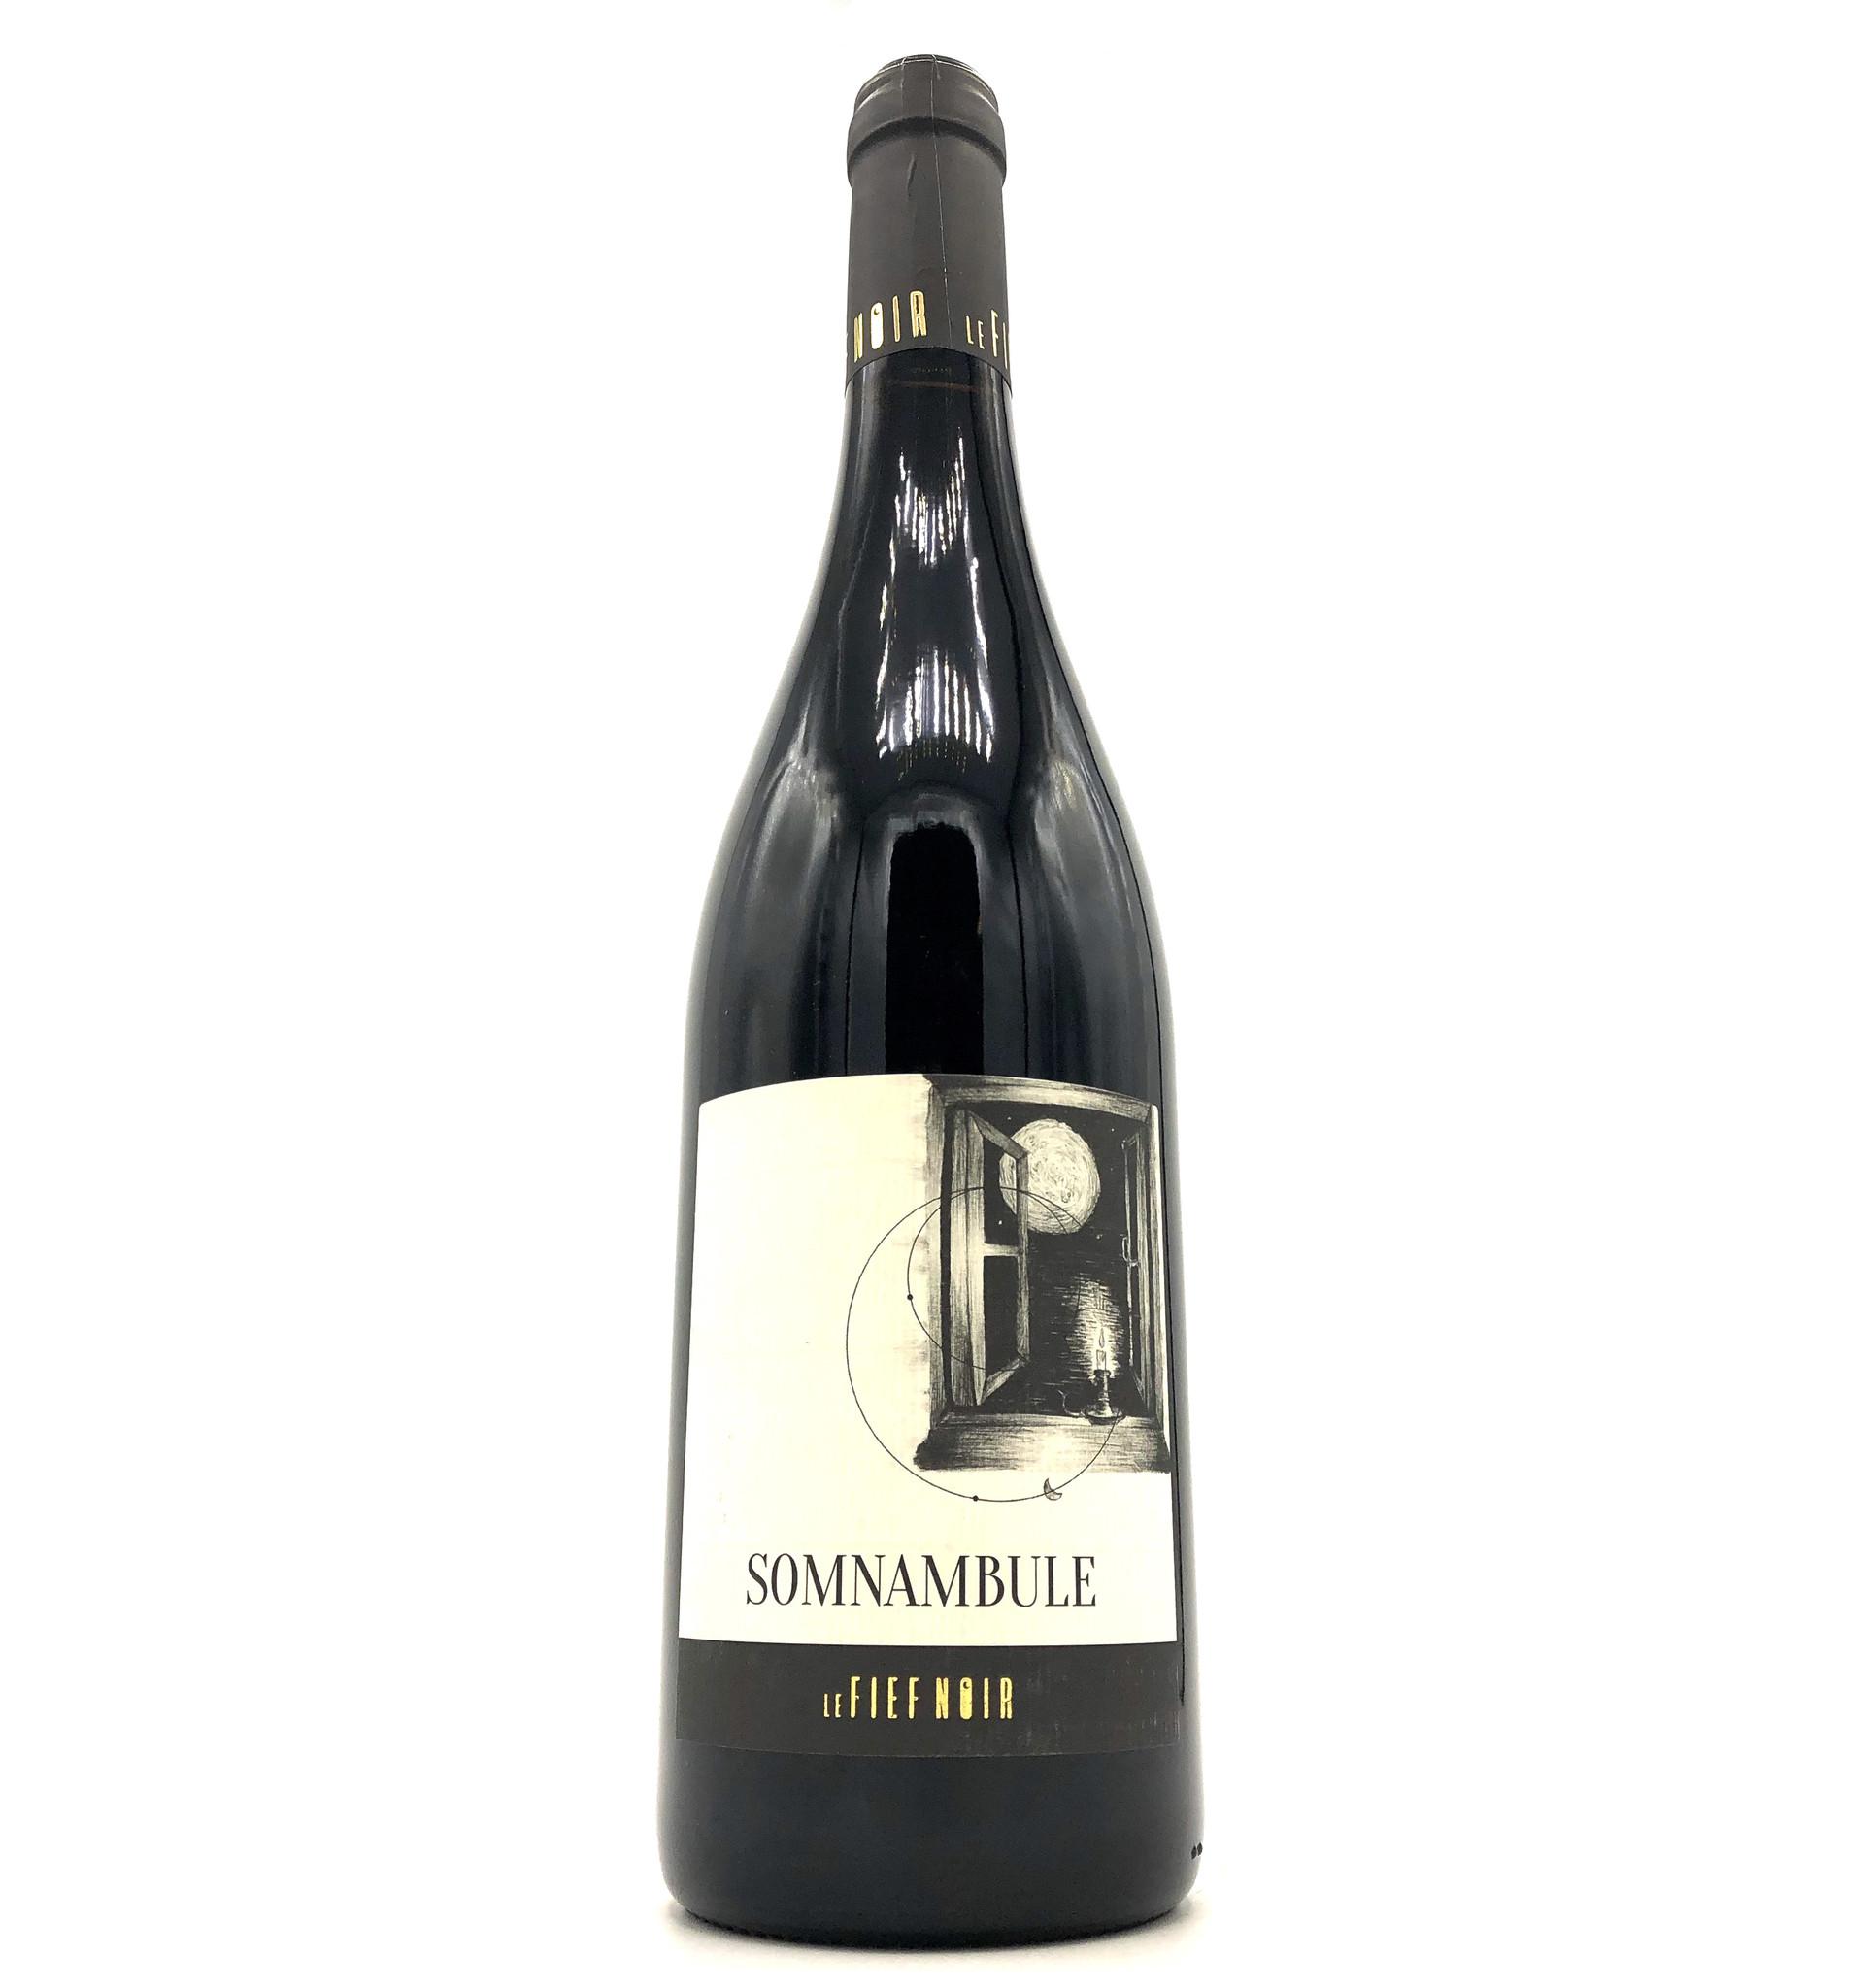 Anjou Somnambule 2018 Le Fief Noir